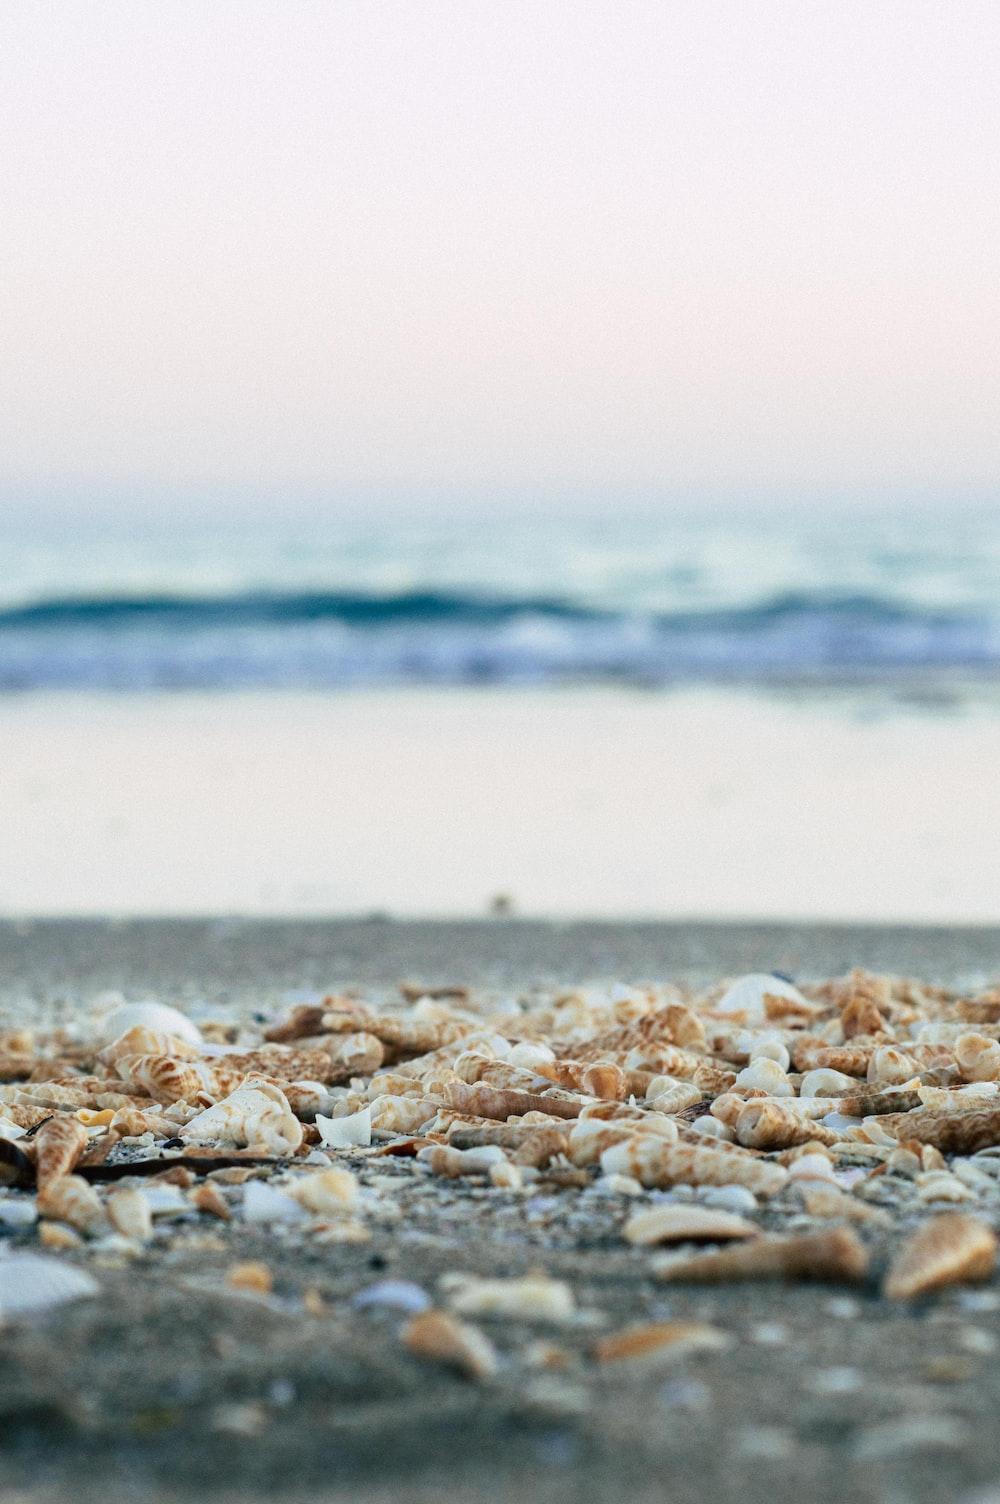 selective focus photography of seashells at seashore